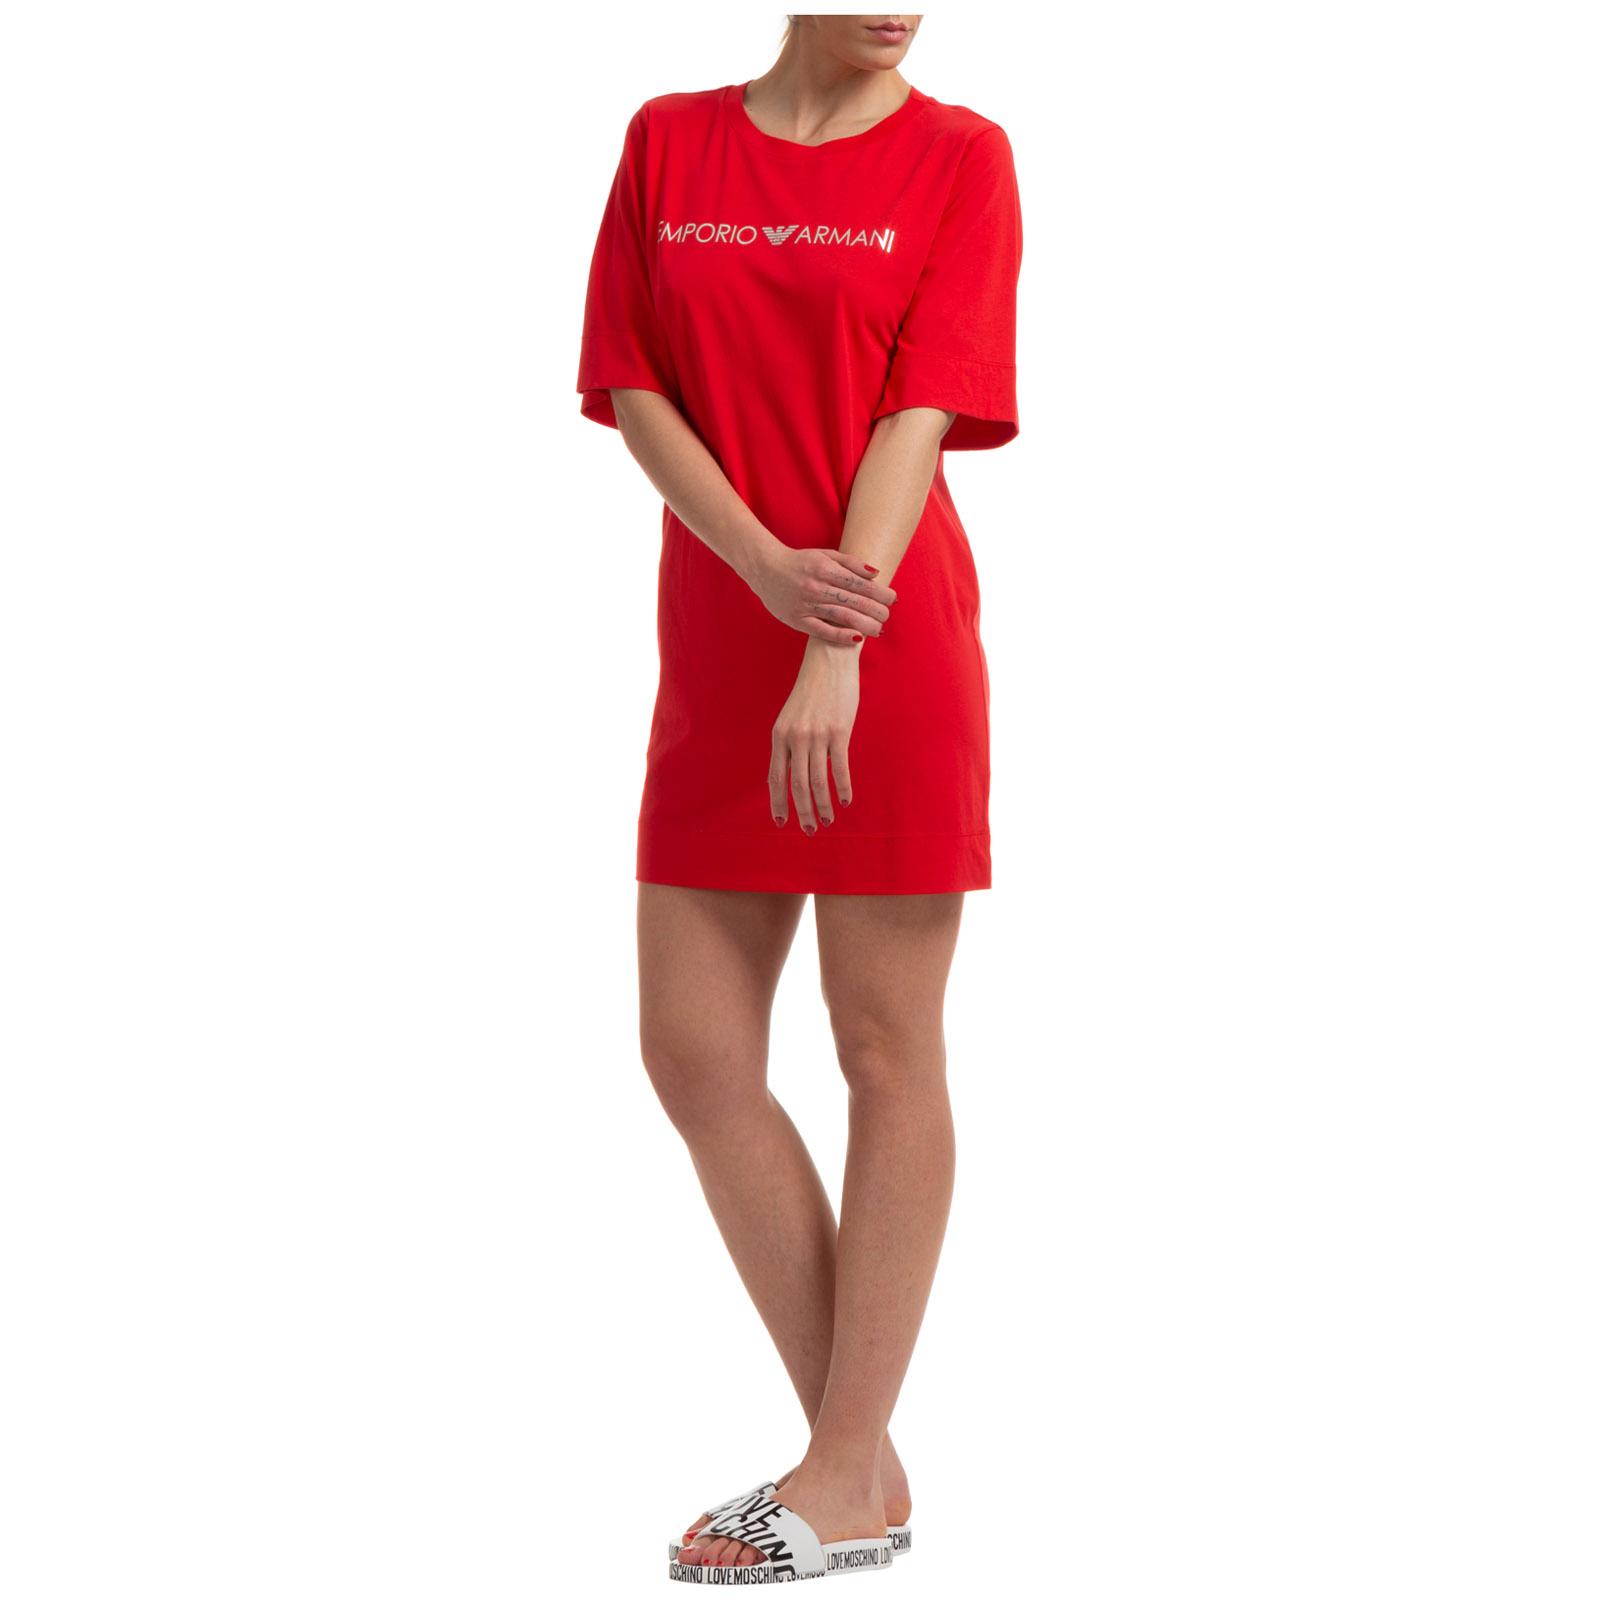 Emporio Armani Shirts WOMEN'S SUMMER DRESS FASHION BEACH COVER UP